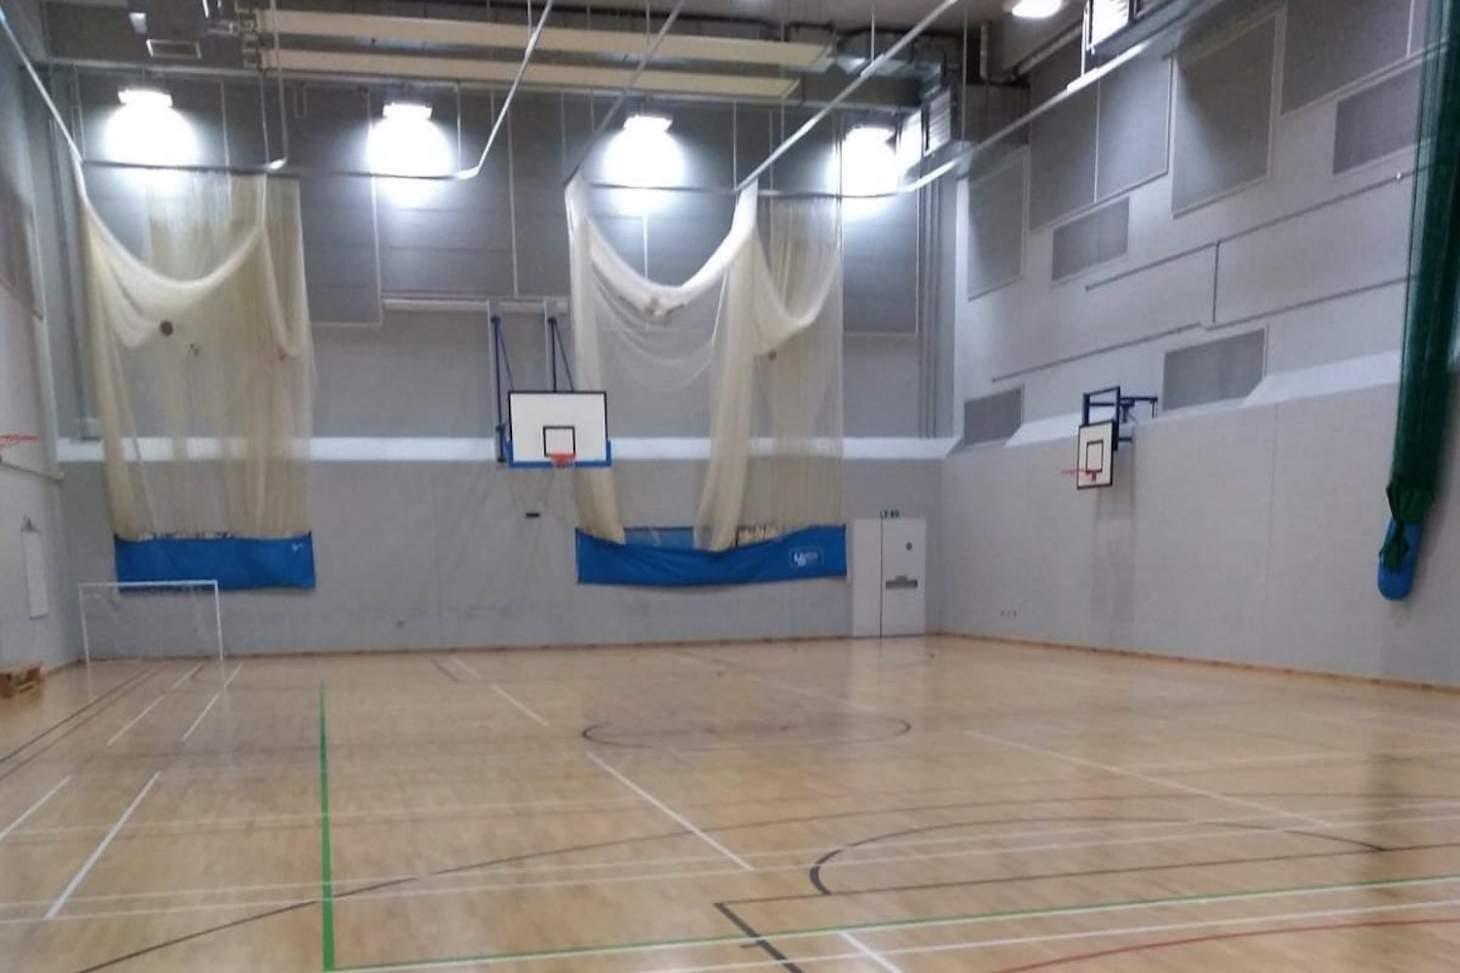 Kensington Aldridge Academy Indoor futsal pitch